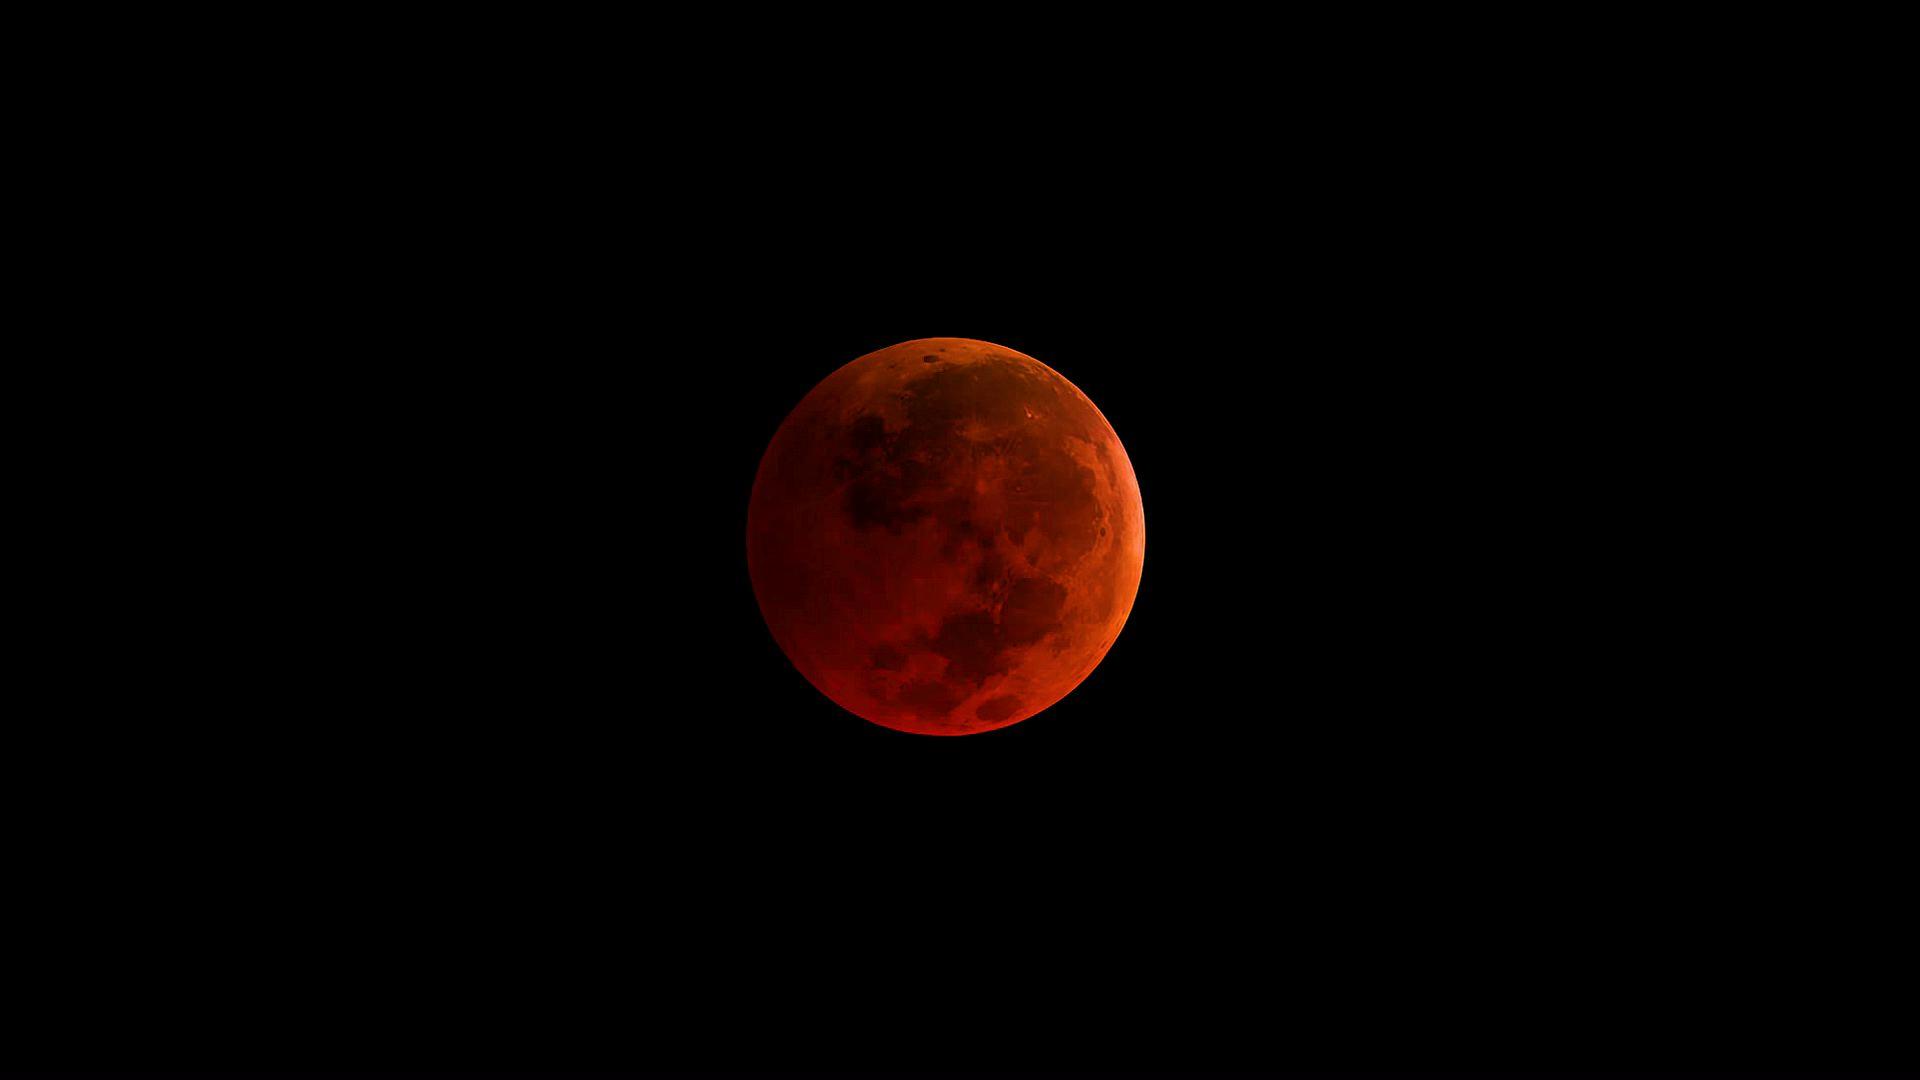 'Blood moon' as seen from NASA's telescopes